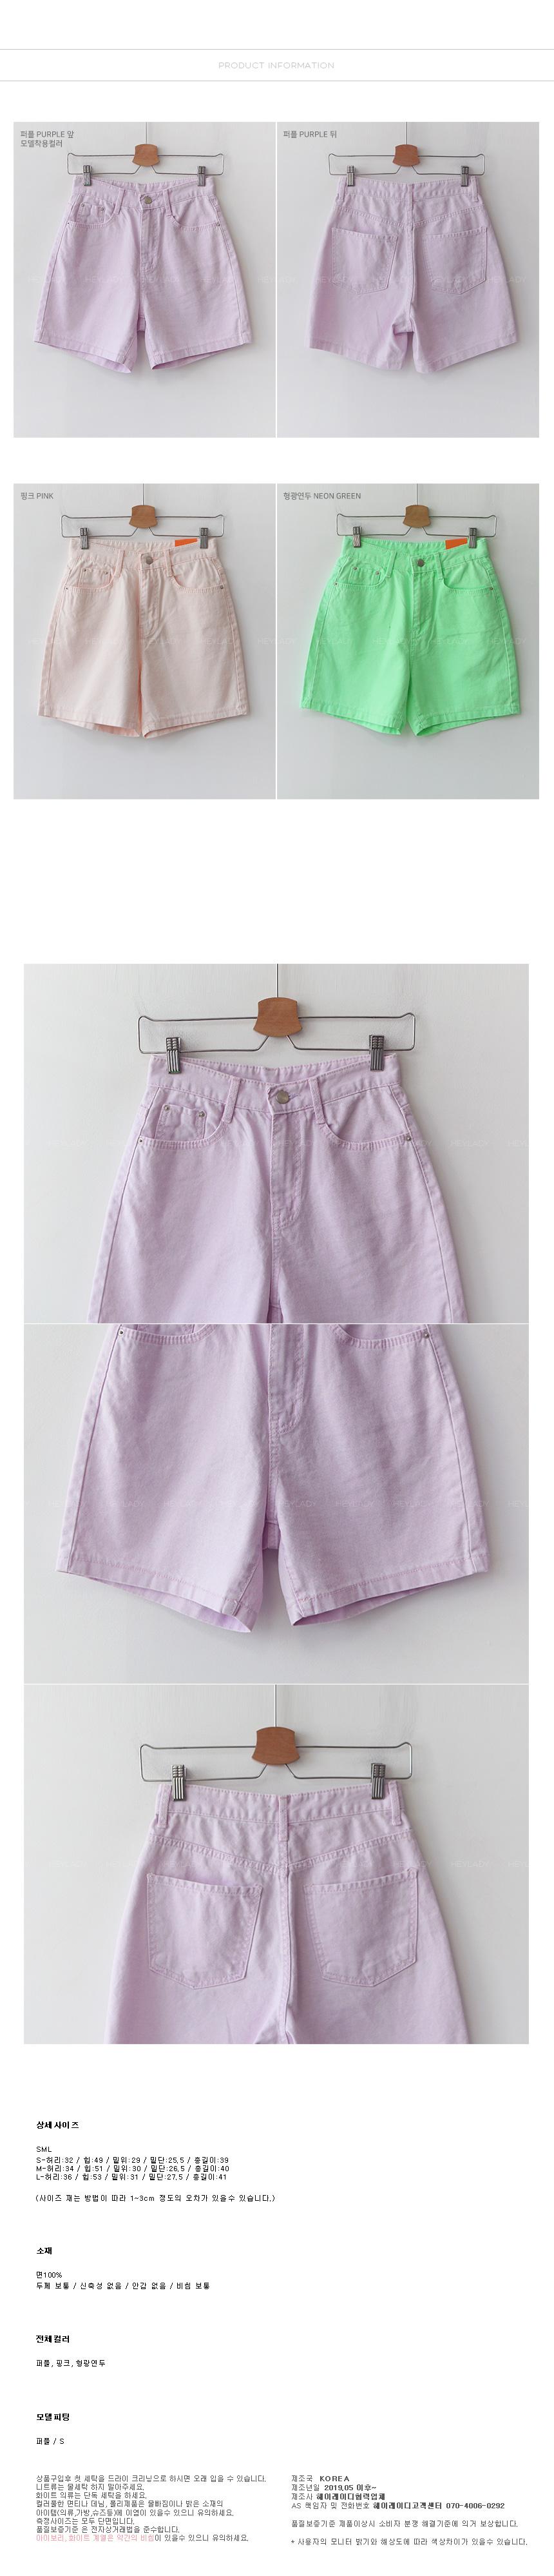 Thunder Neon Cotton Short Pants